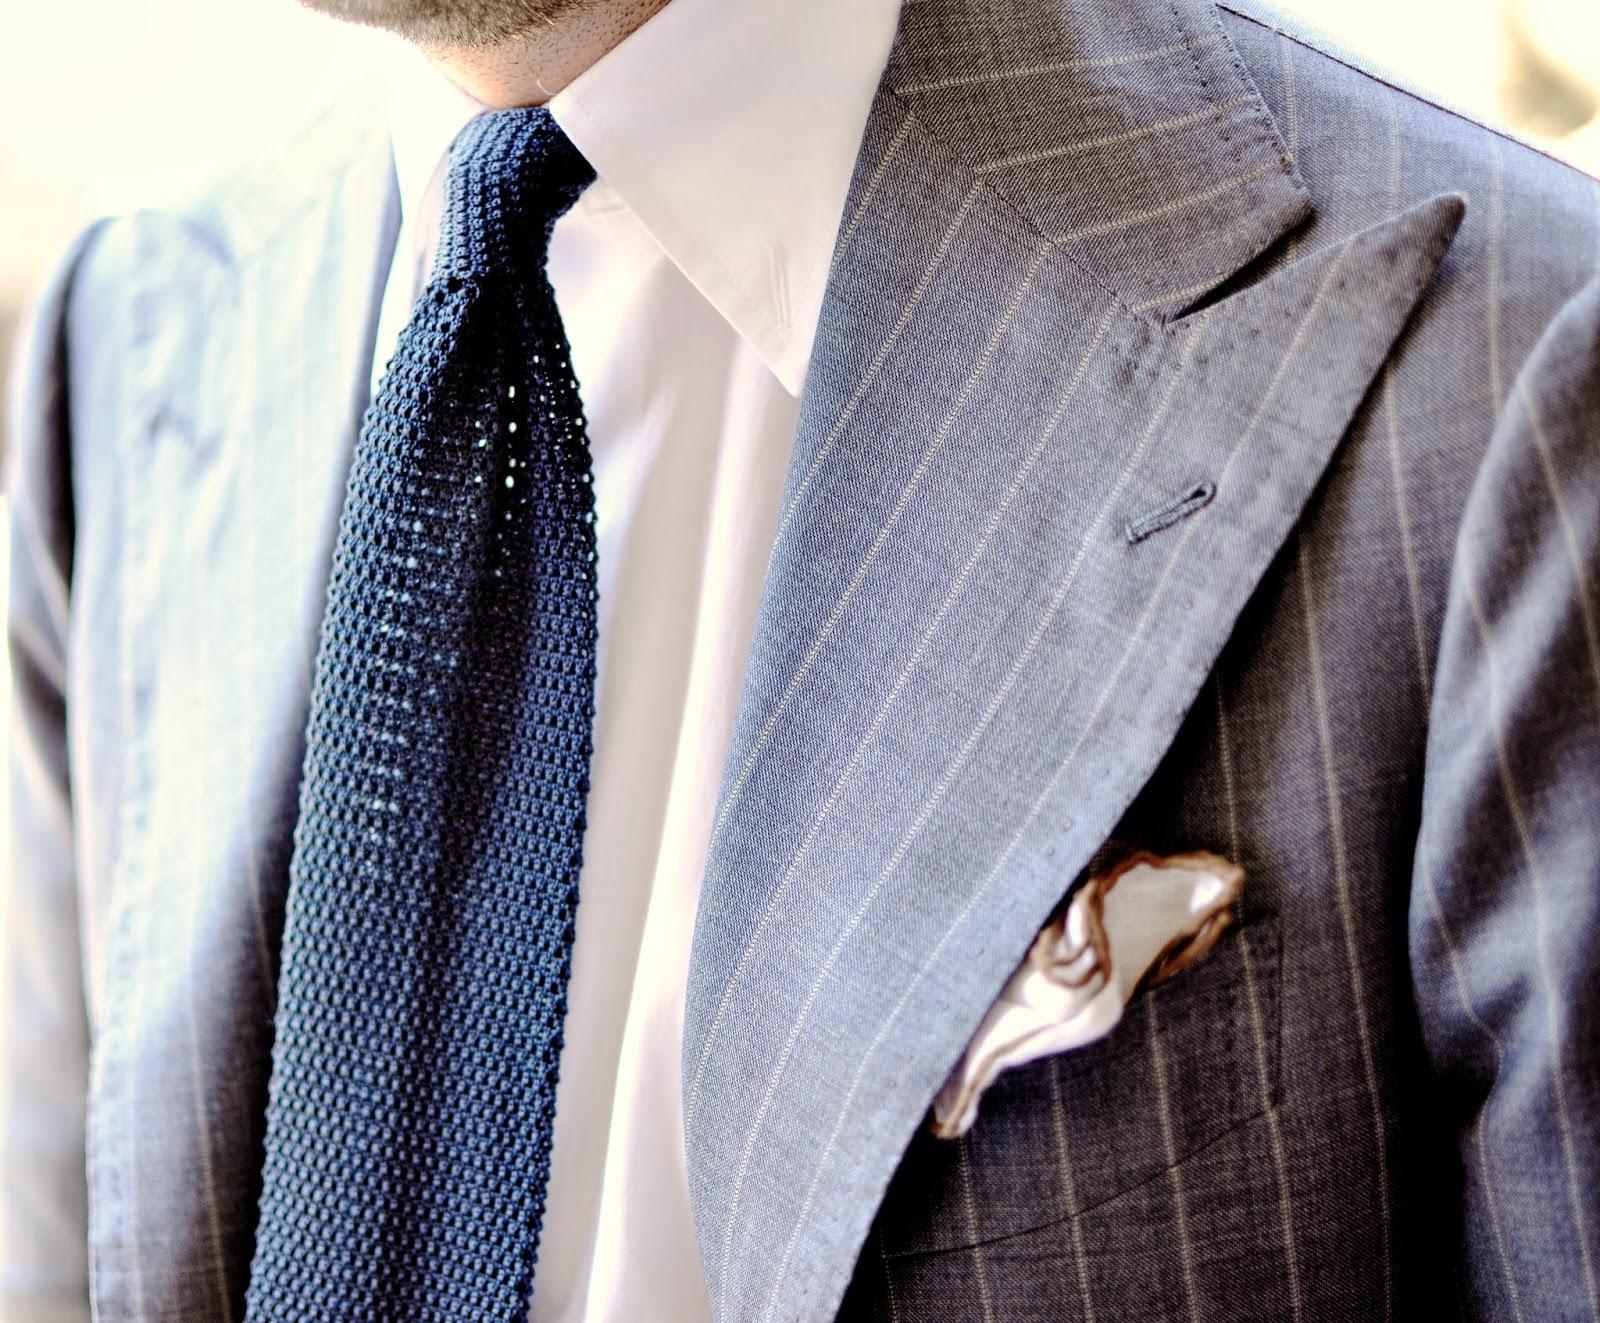 Distinctive features of Neapolitan Tailoring